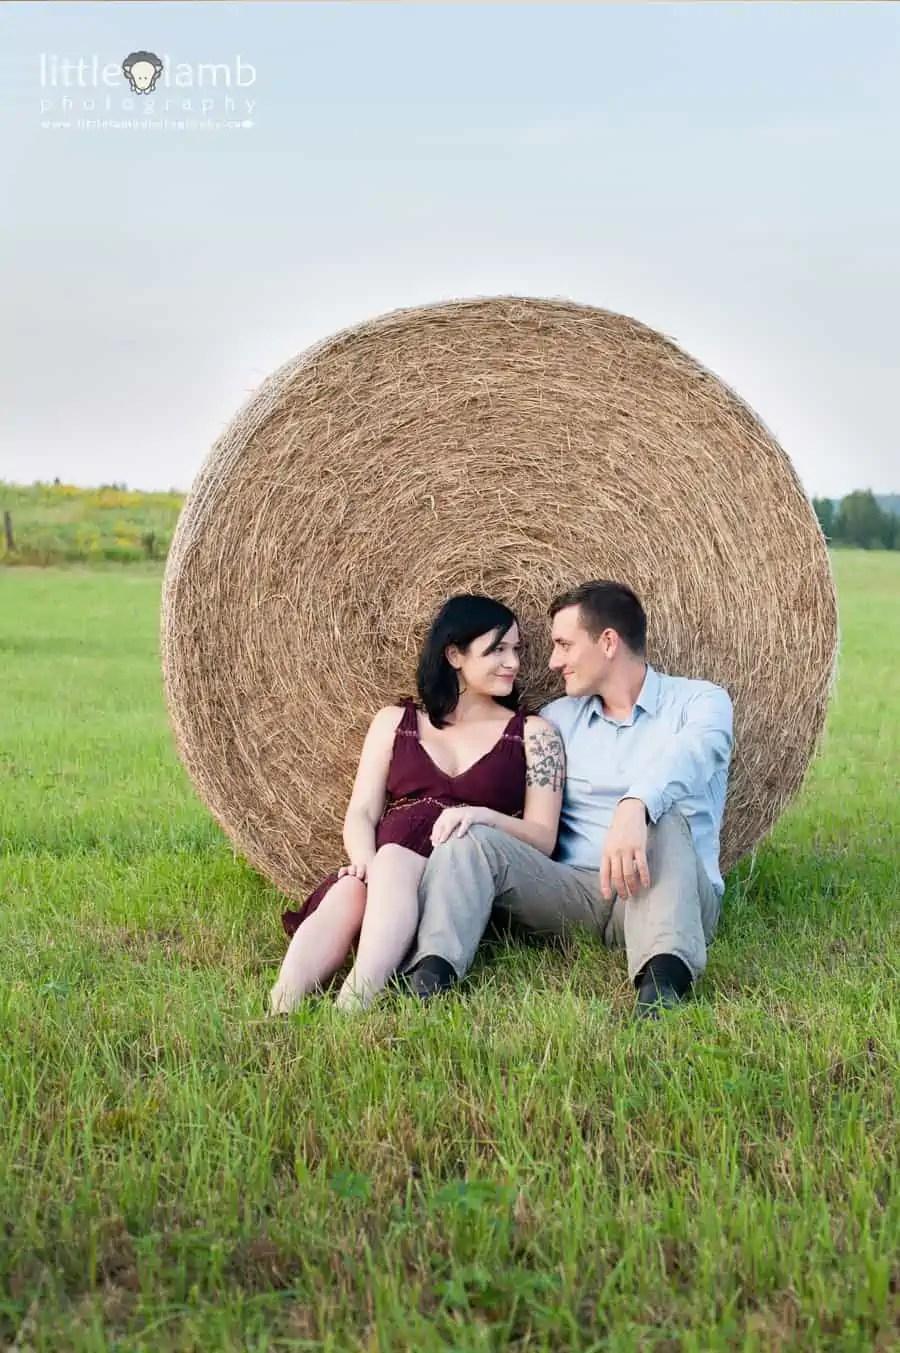 little-lamb-photography-maternity-photos-17A